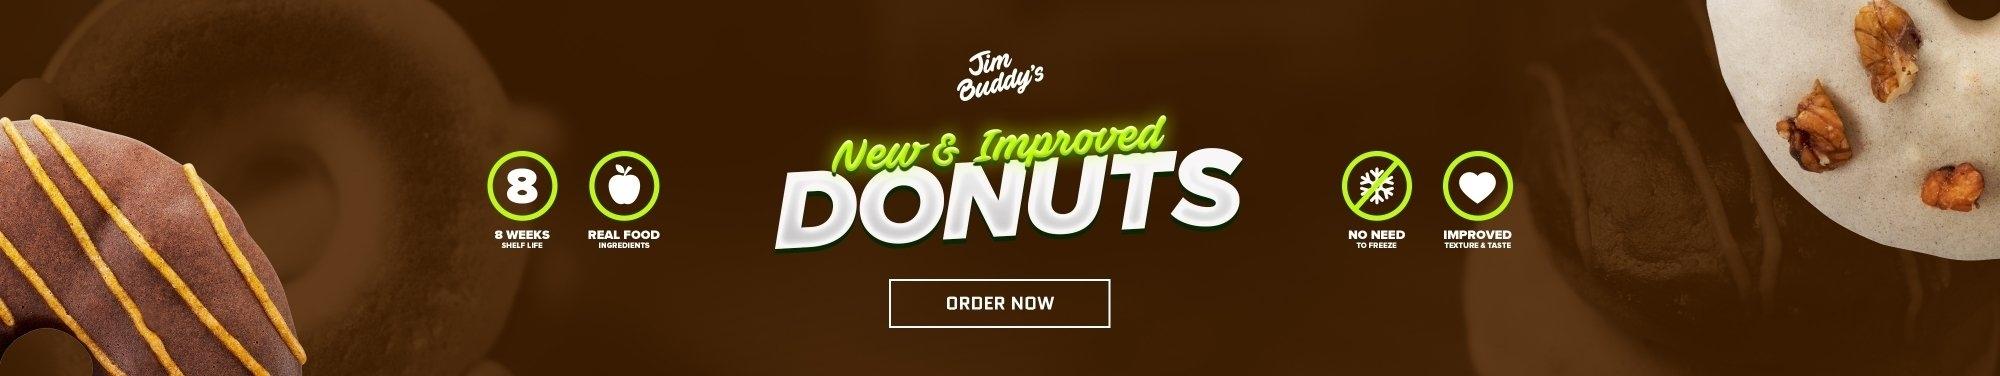 Jim Buddy Protein Donuts